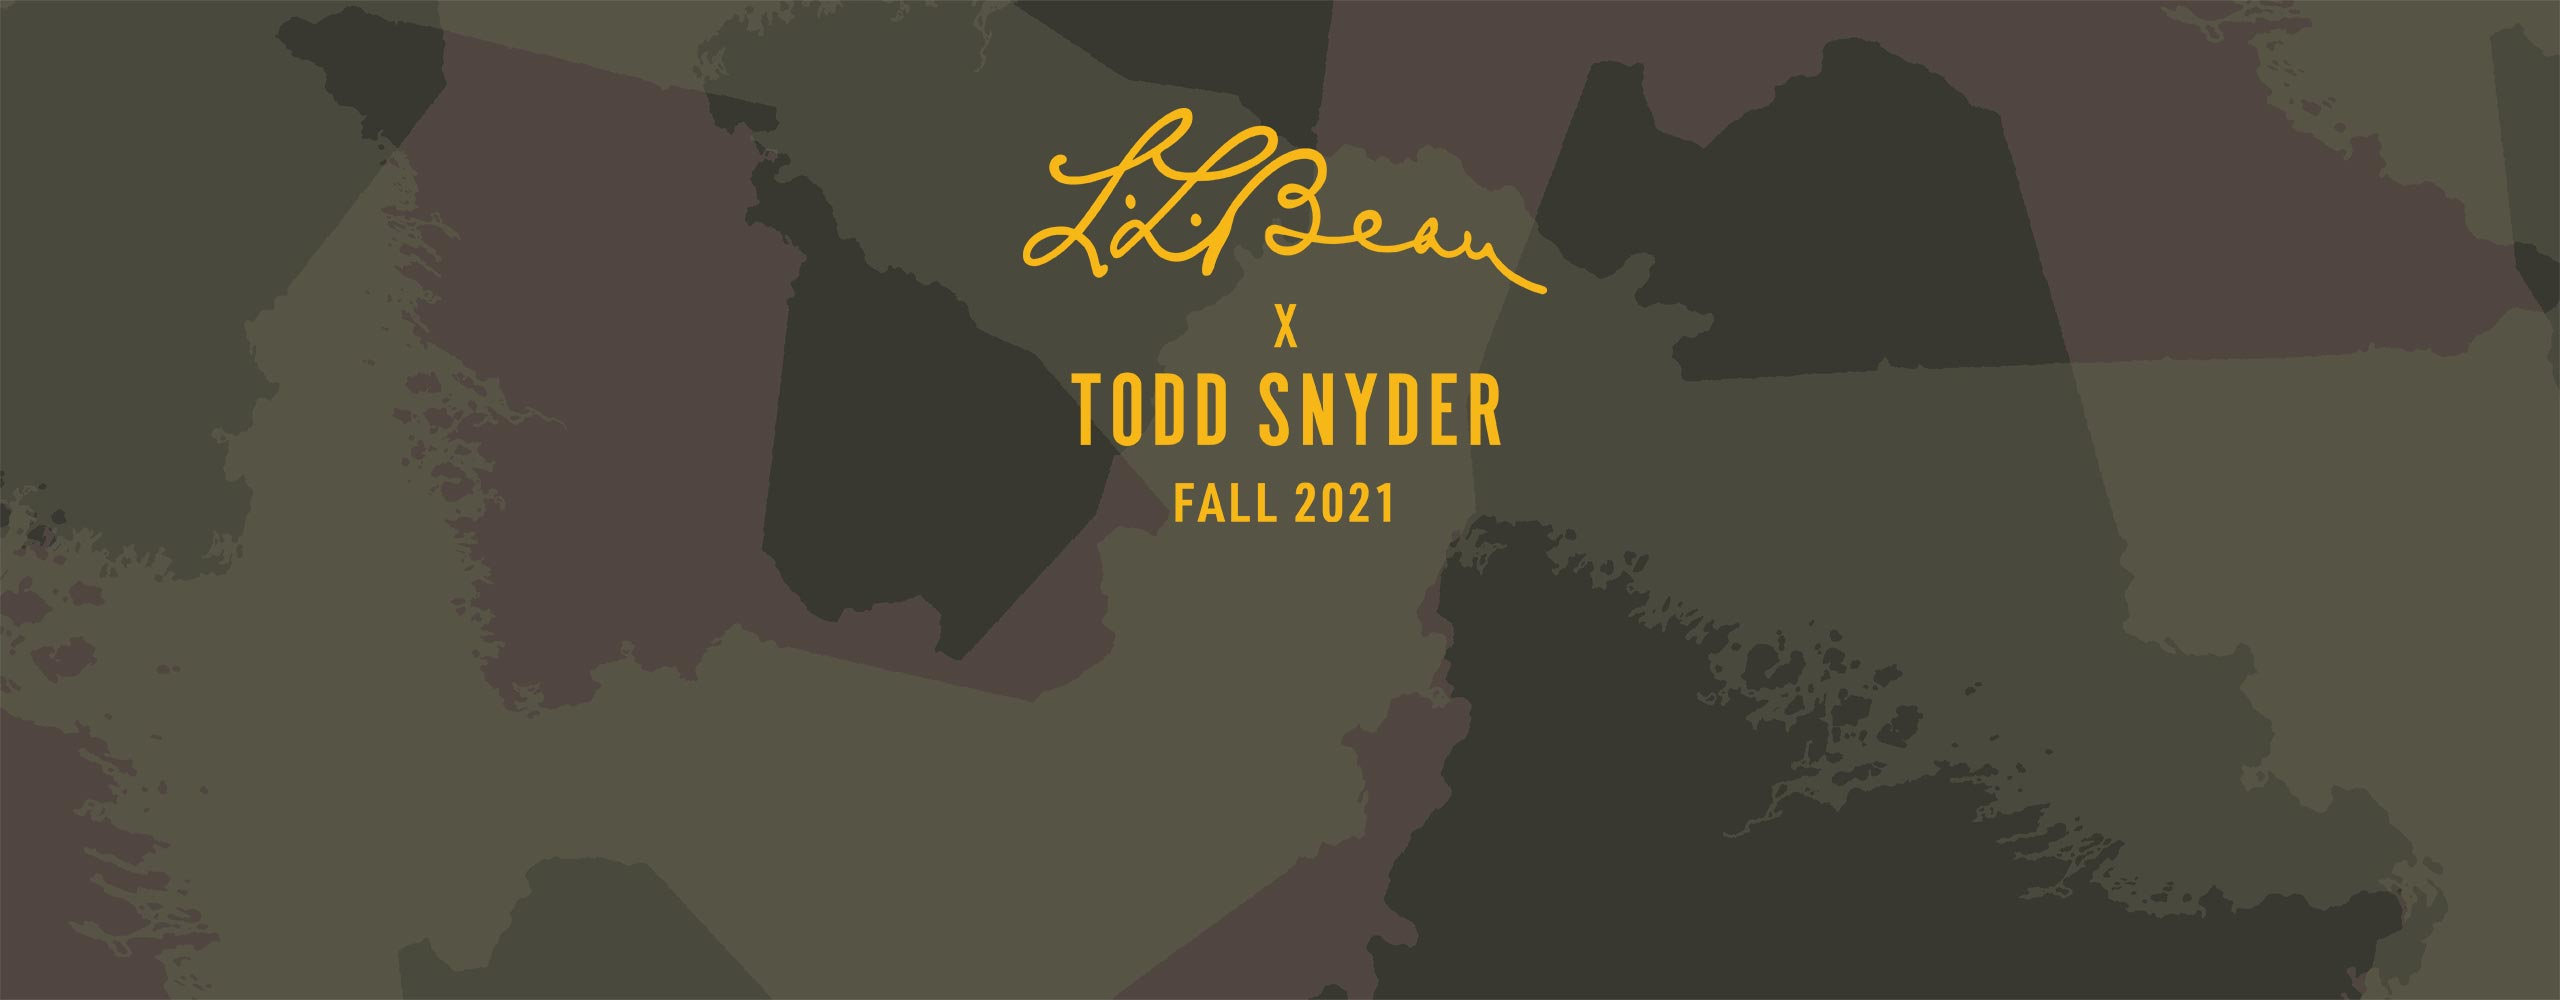 L.L.Bean x Todd Snyder Fall 2021